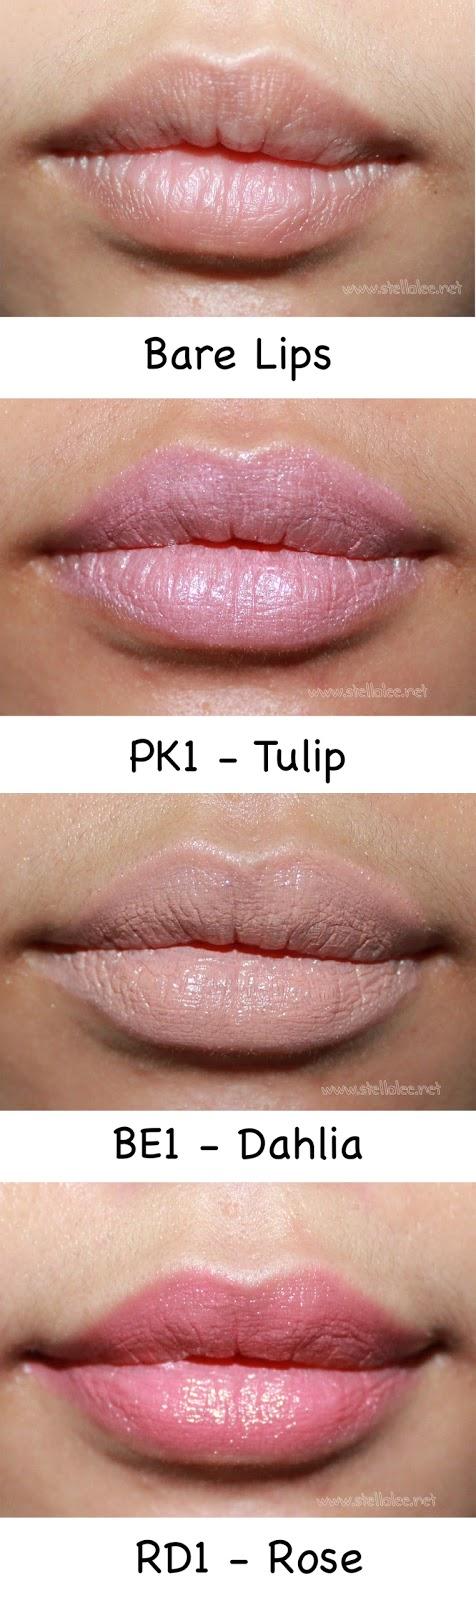 Brigitte Blooming Rouge Lipstick result